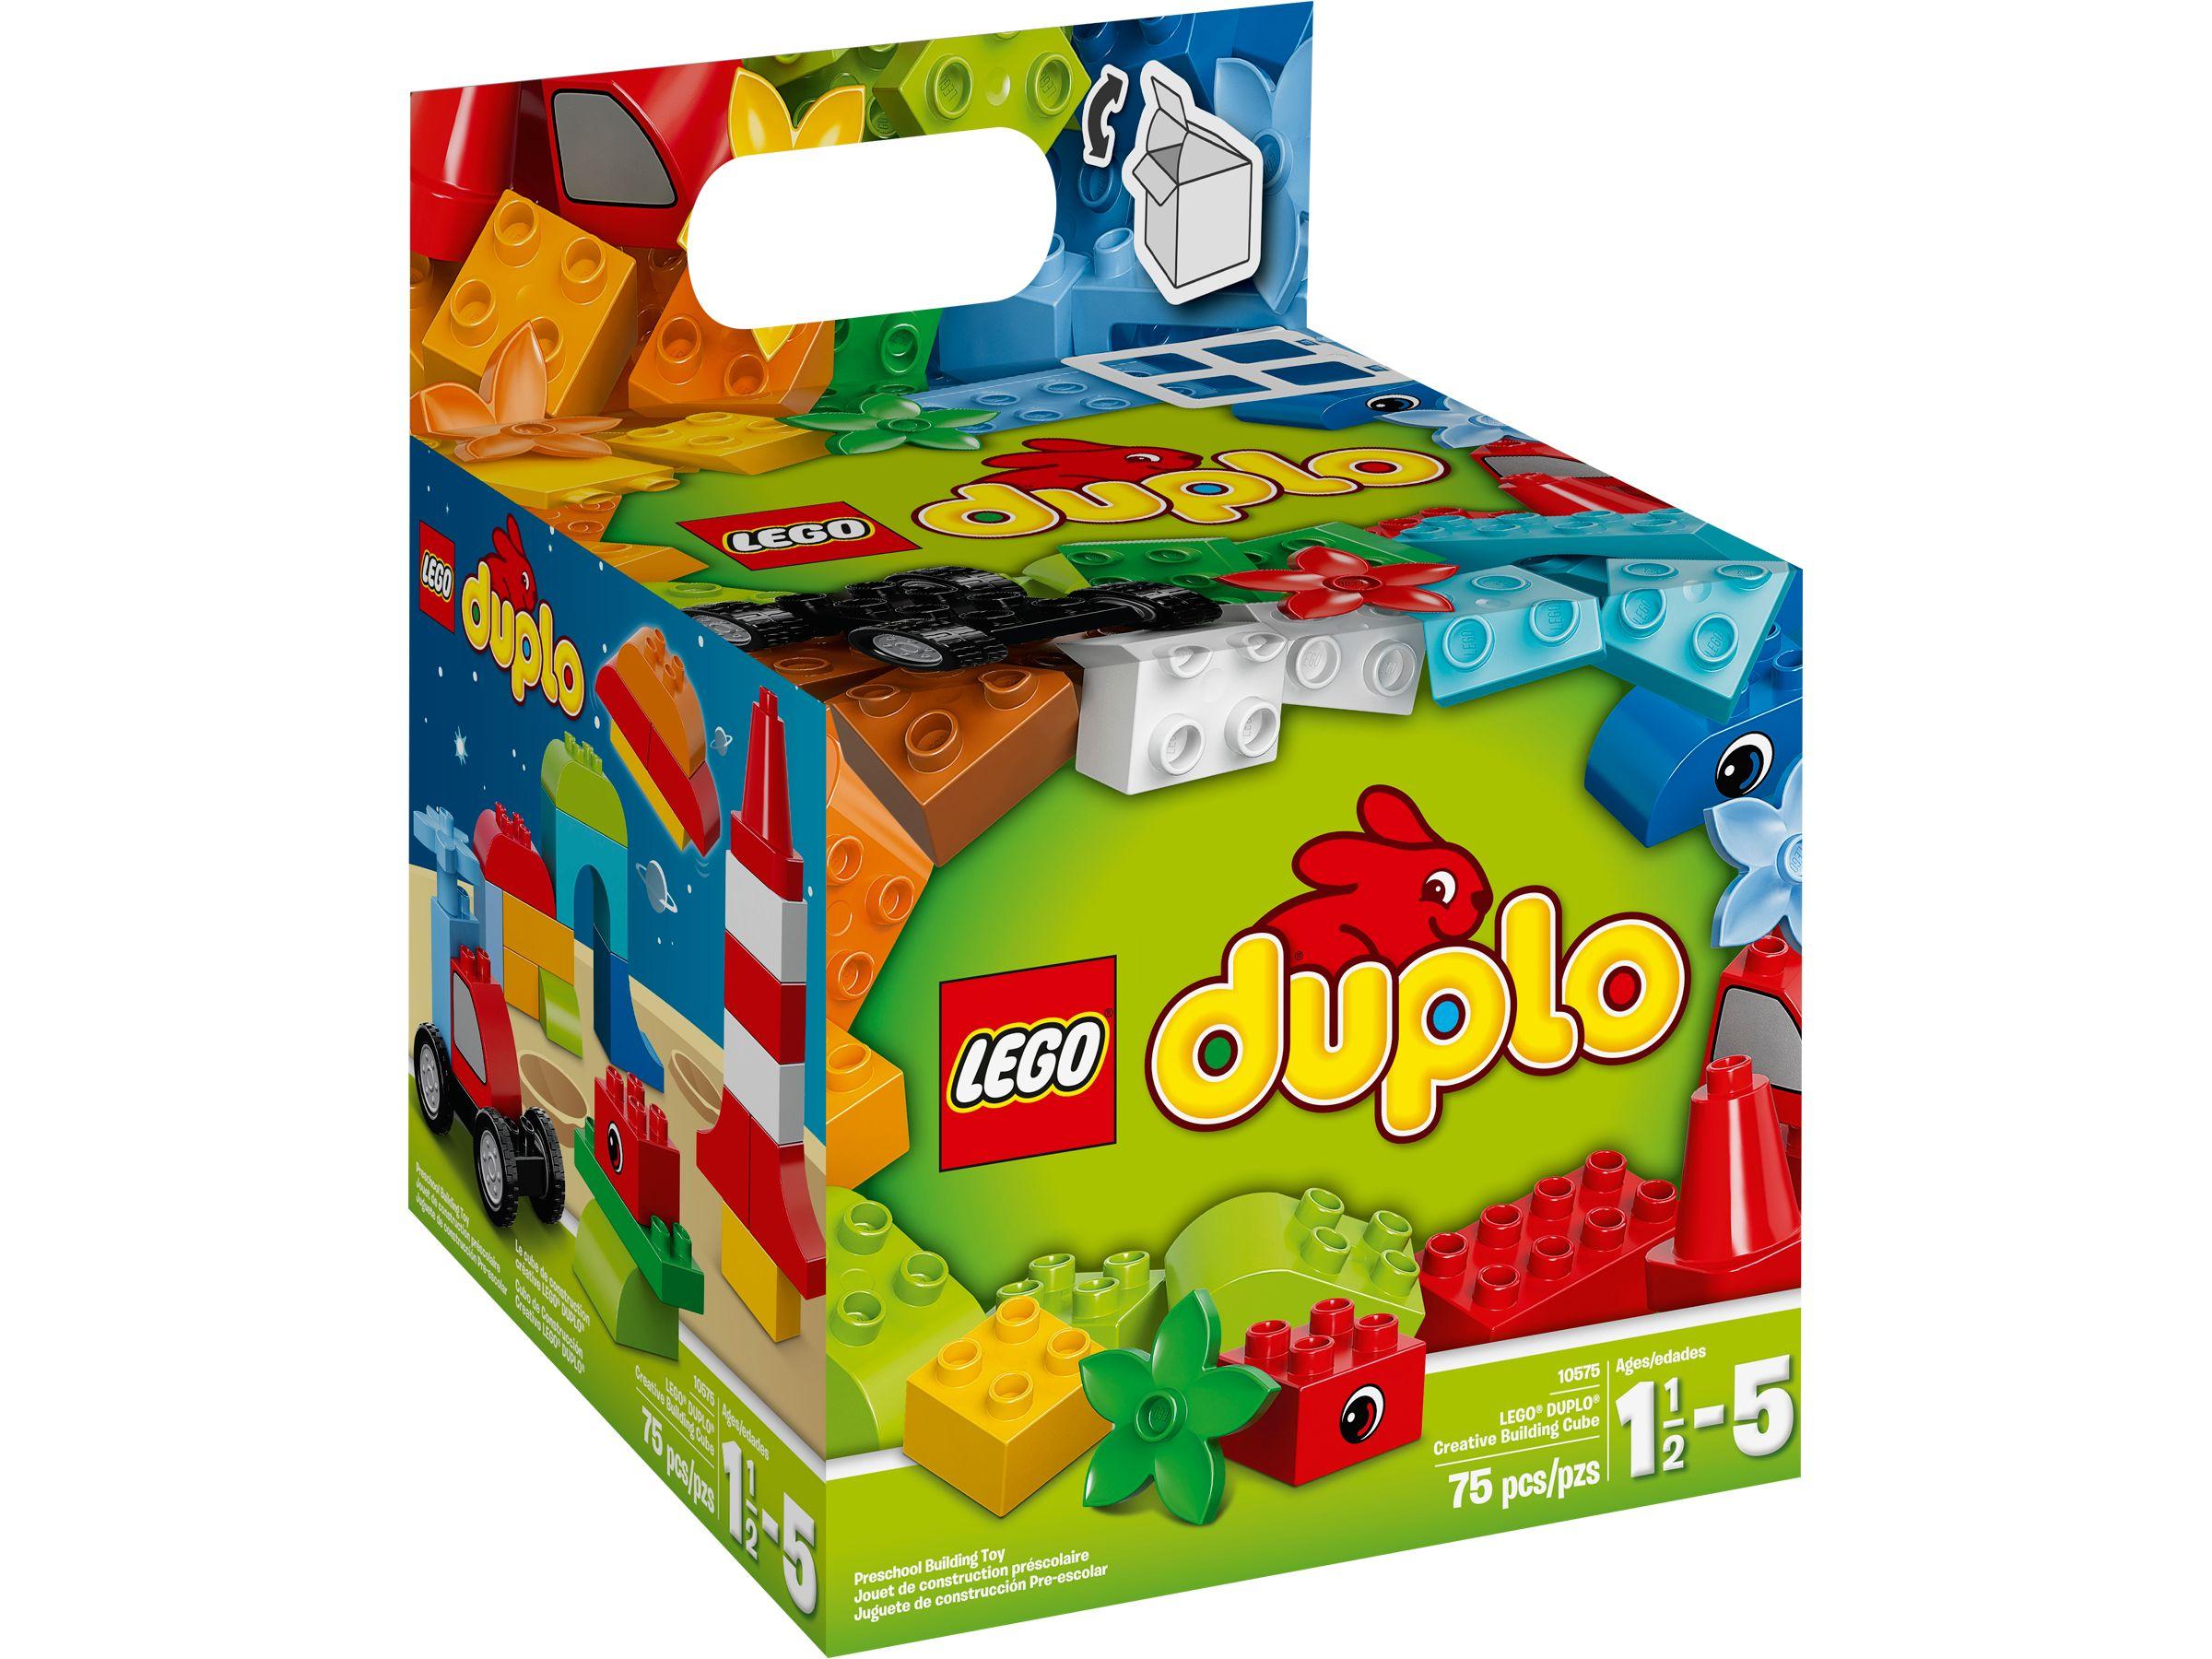 10575 Creative Building Cube